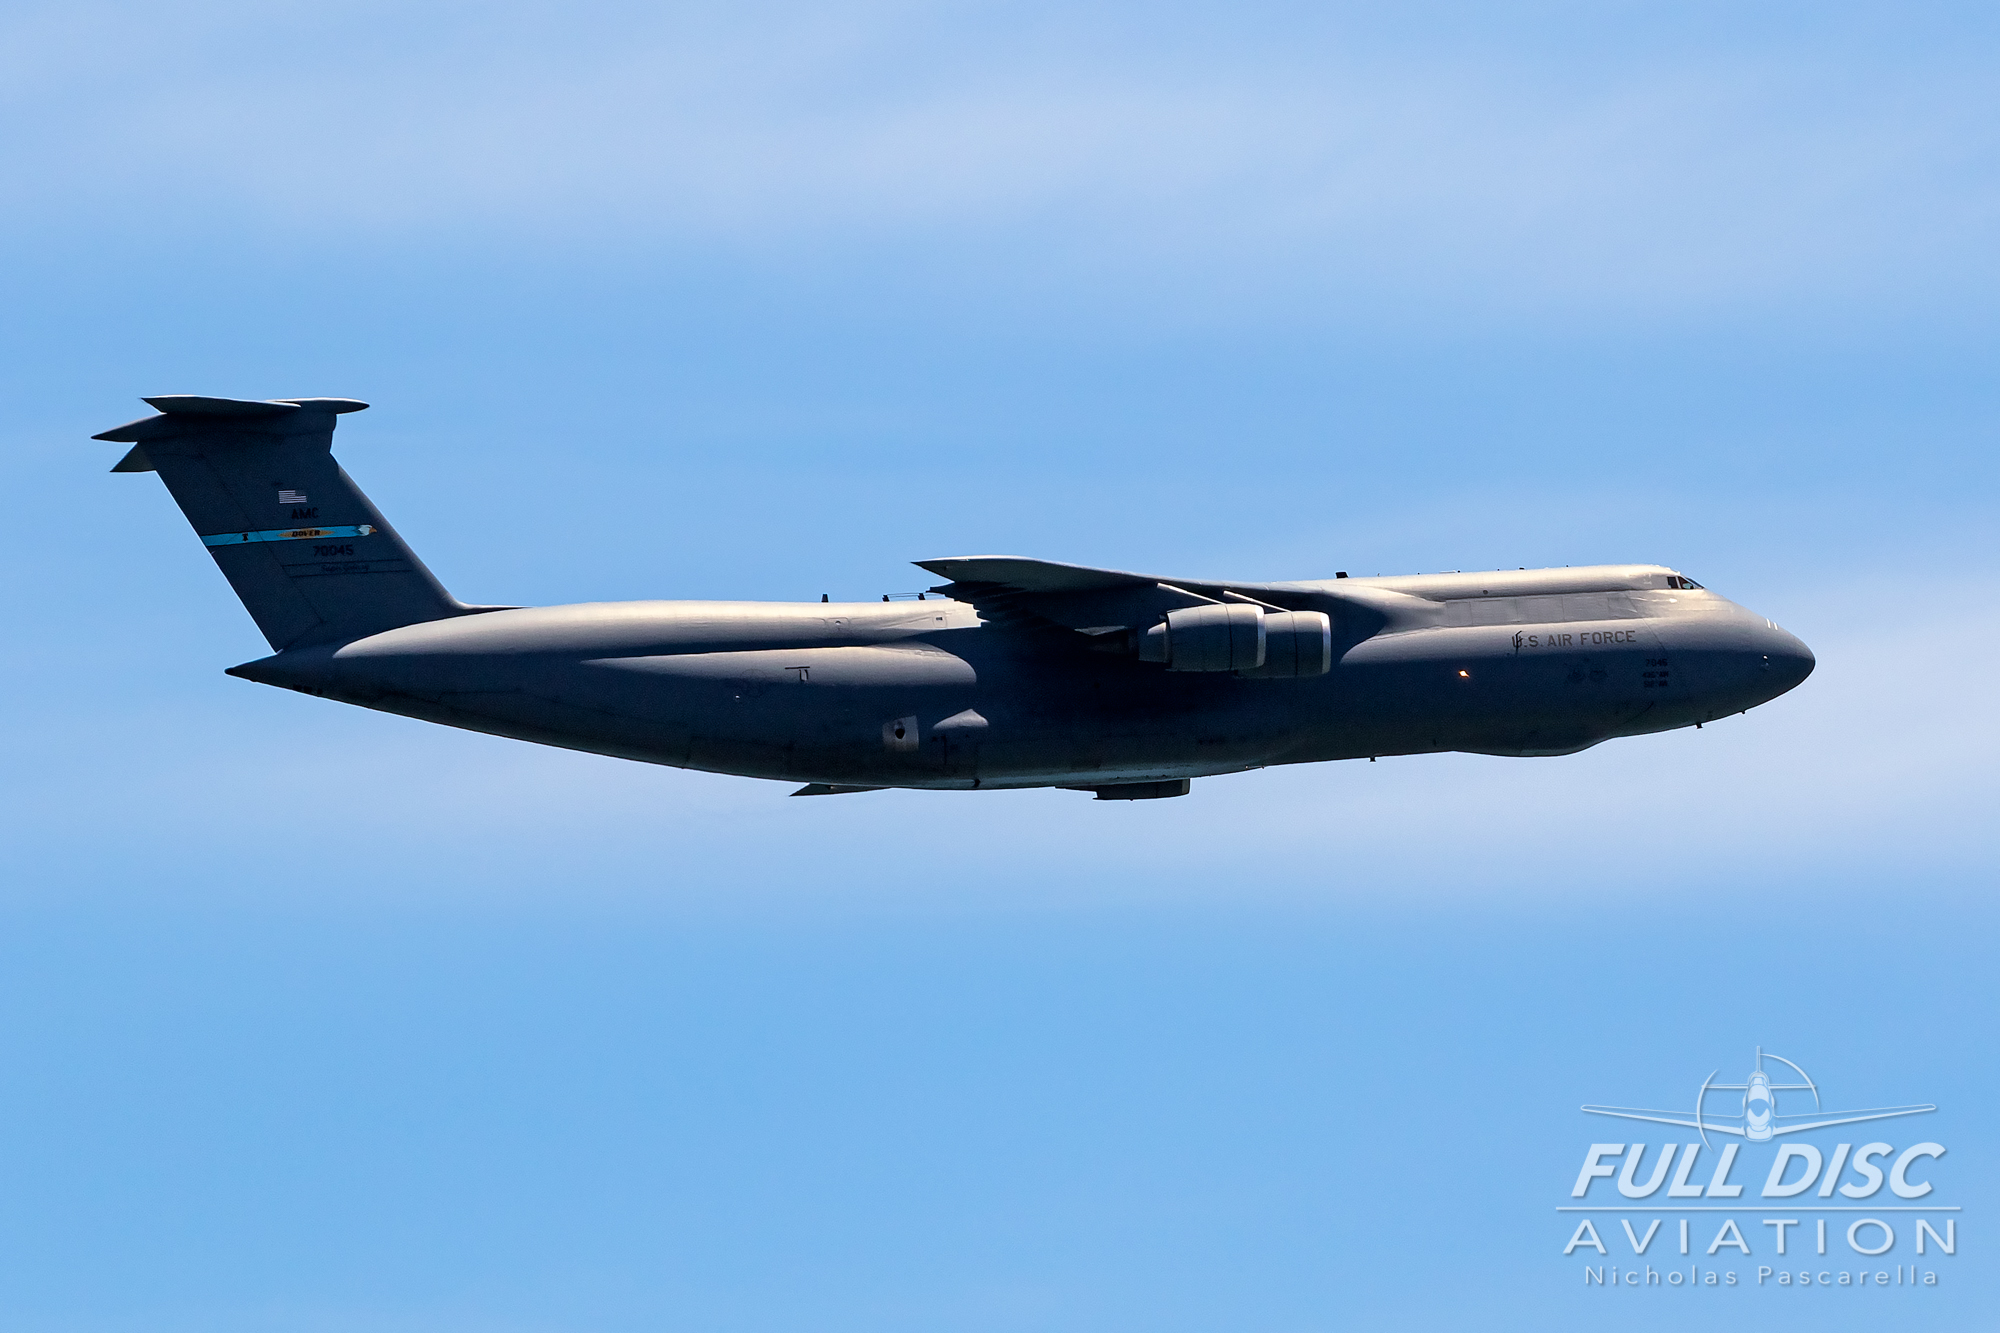 nickpascarella_fulldiscaviation_oceancityairshow_aviation_c5.jpg